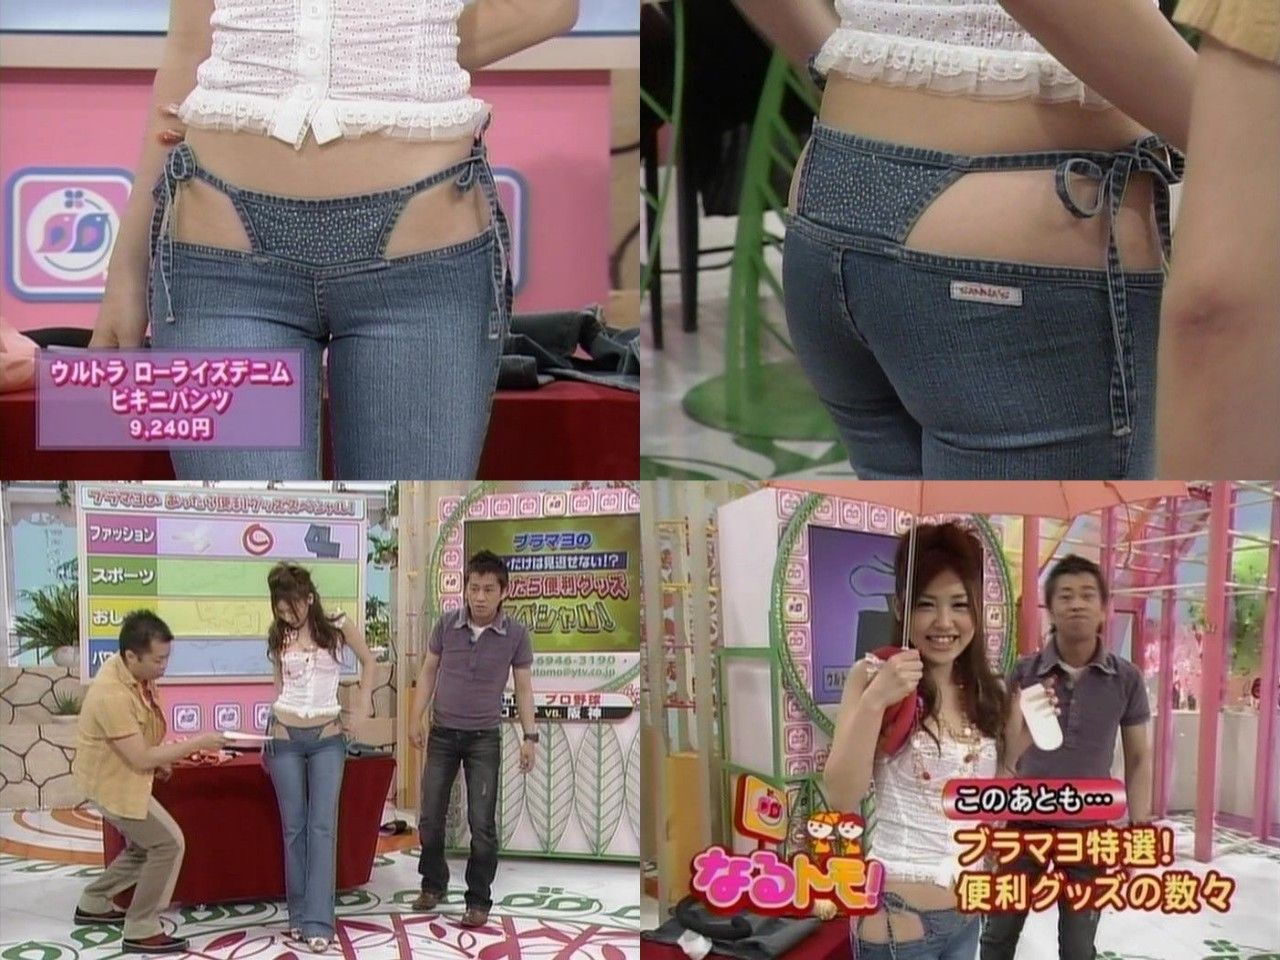 Franksemails com latest japanese fashion trend